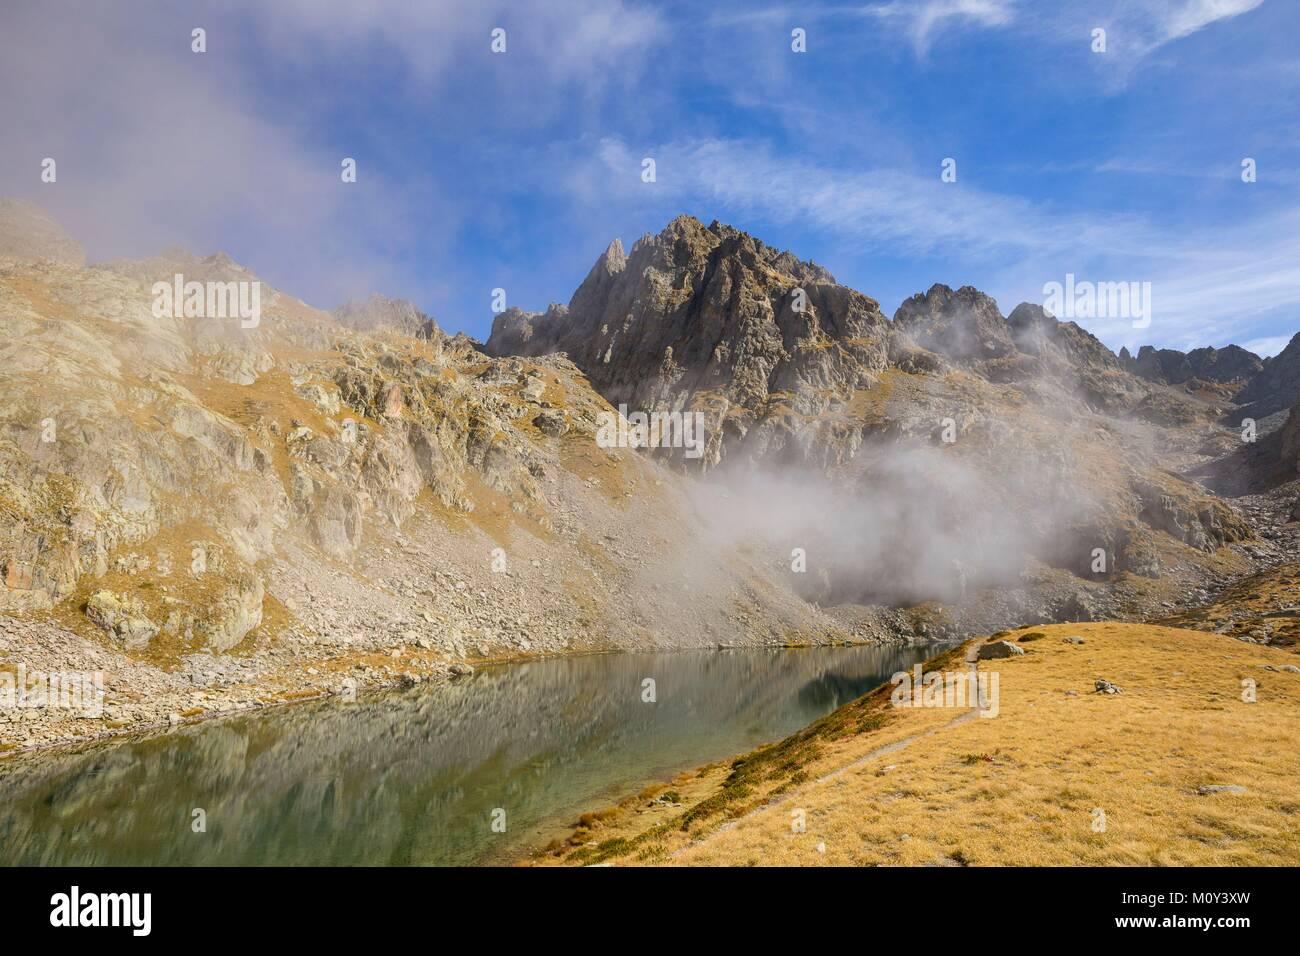 France,Alpes-Maritimes,Mercantour National Park,Gordolasque Valley,lake Autier (2275m) Stock Photo